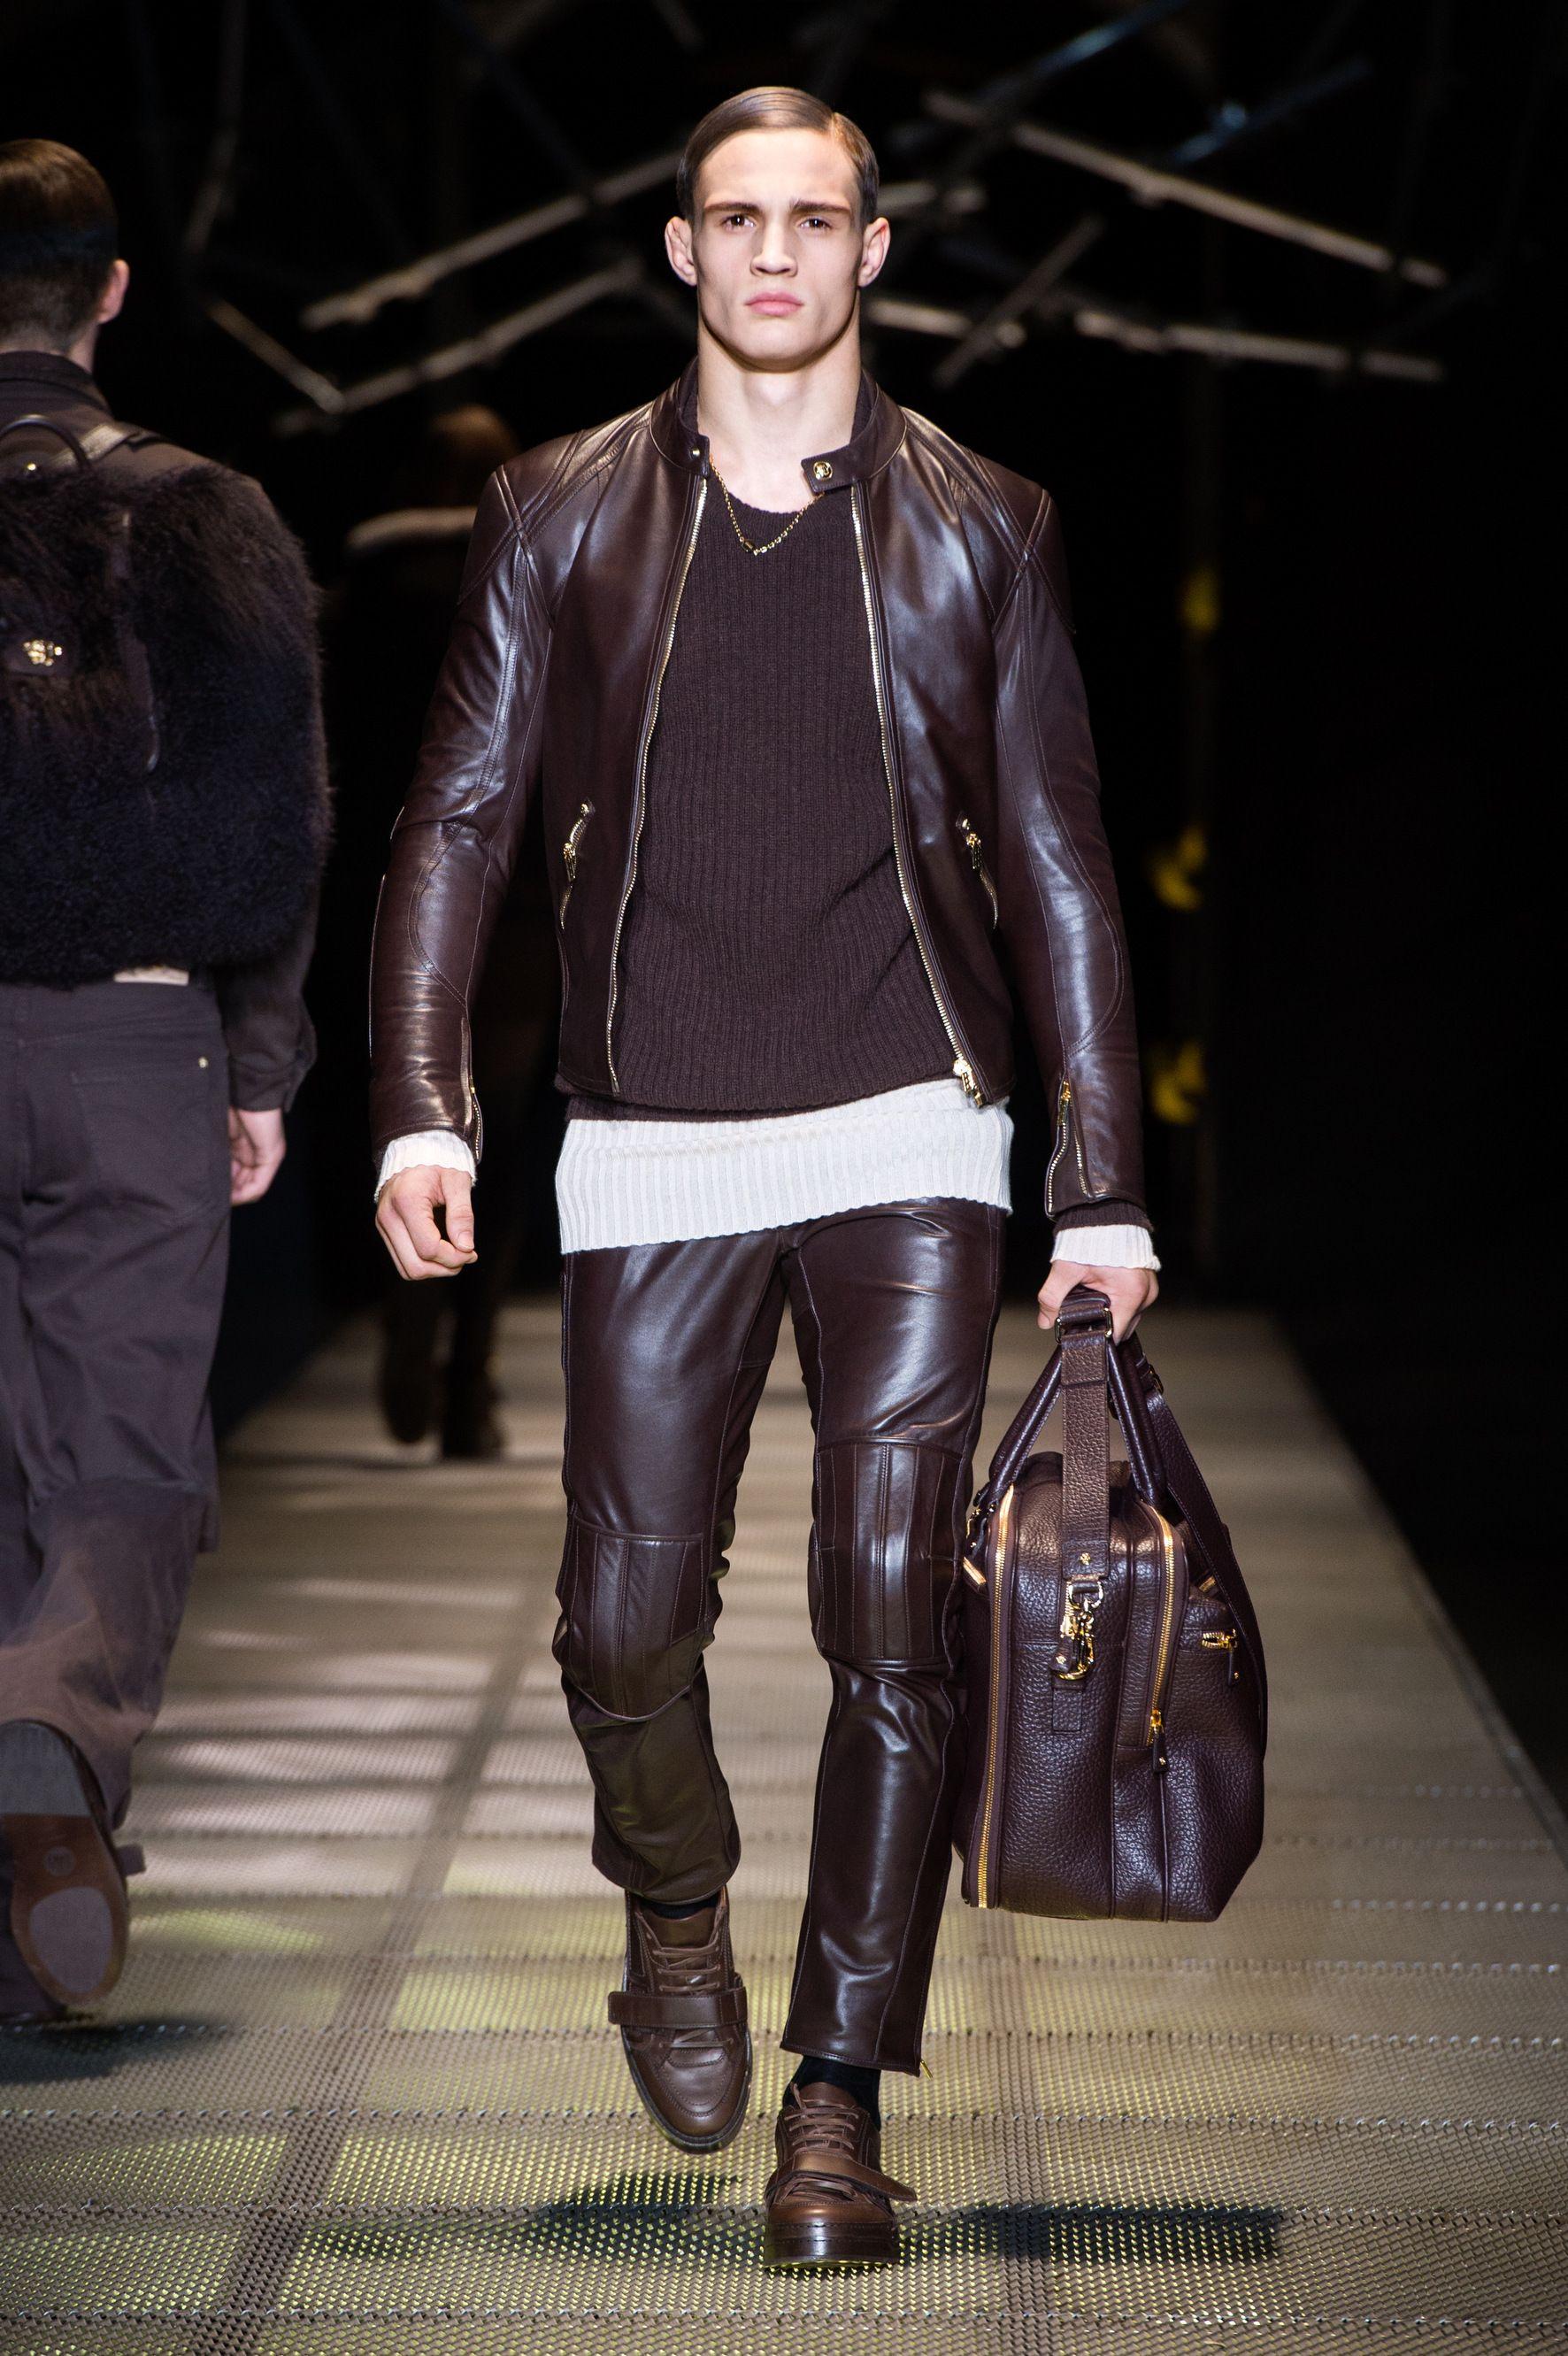 Order of program for church fashion show - Watch Versace Men S Fashion Show